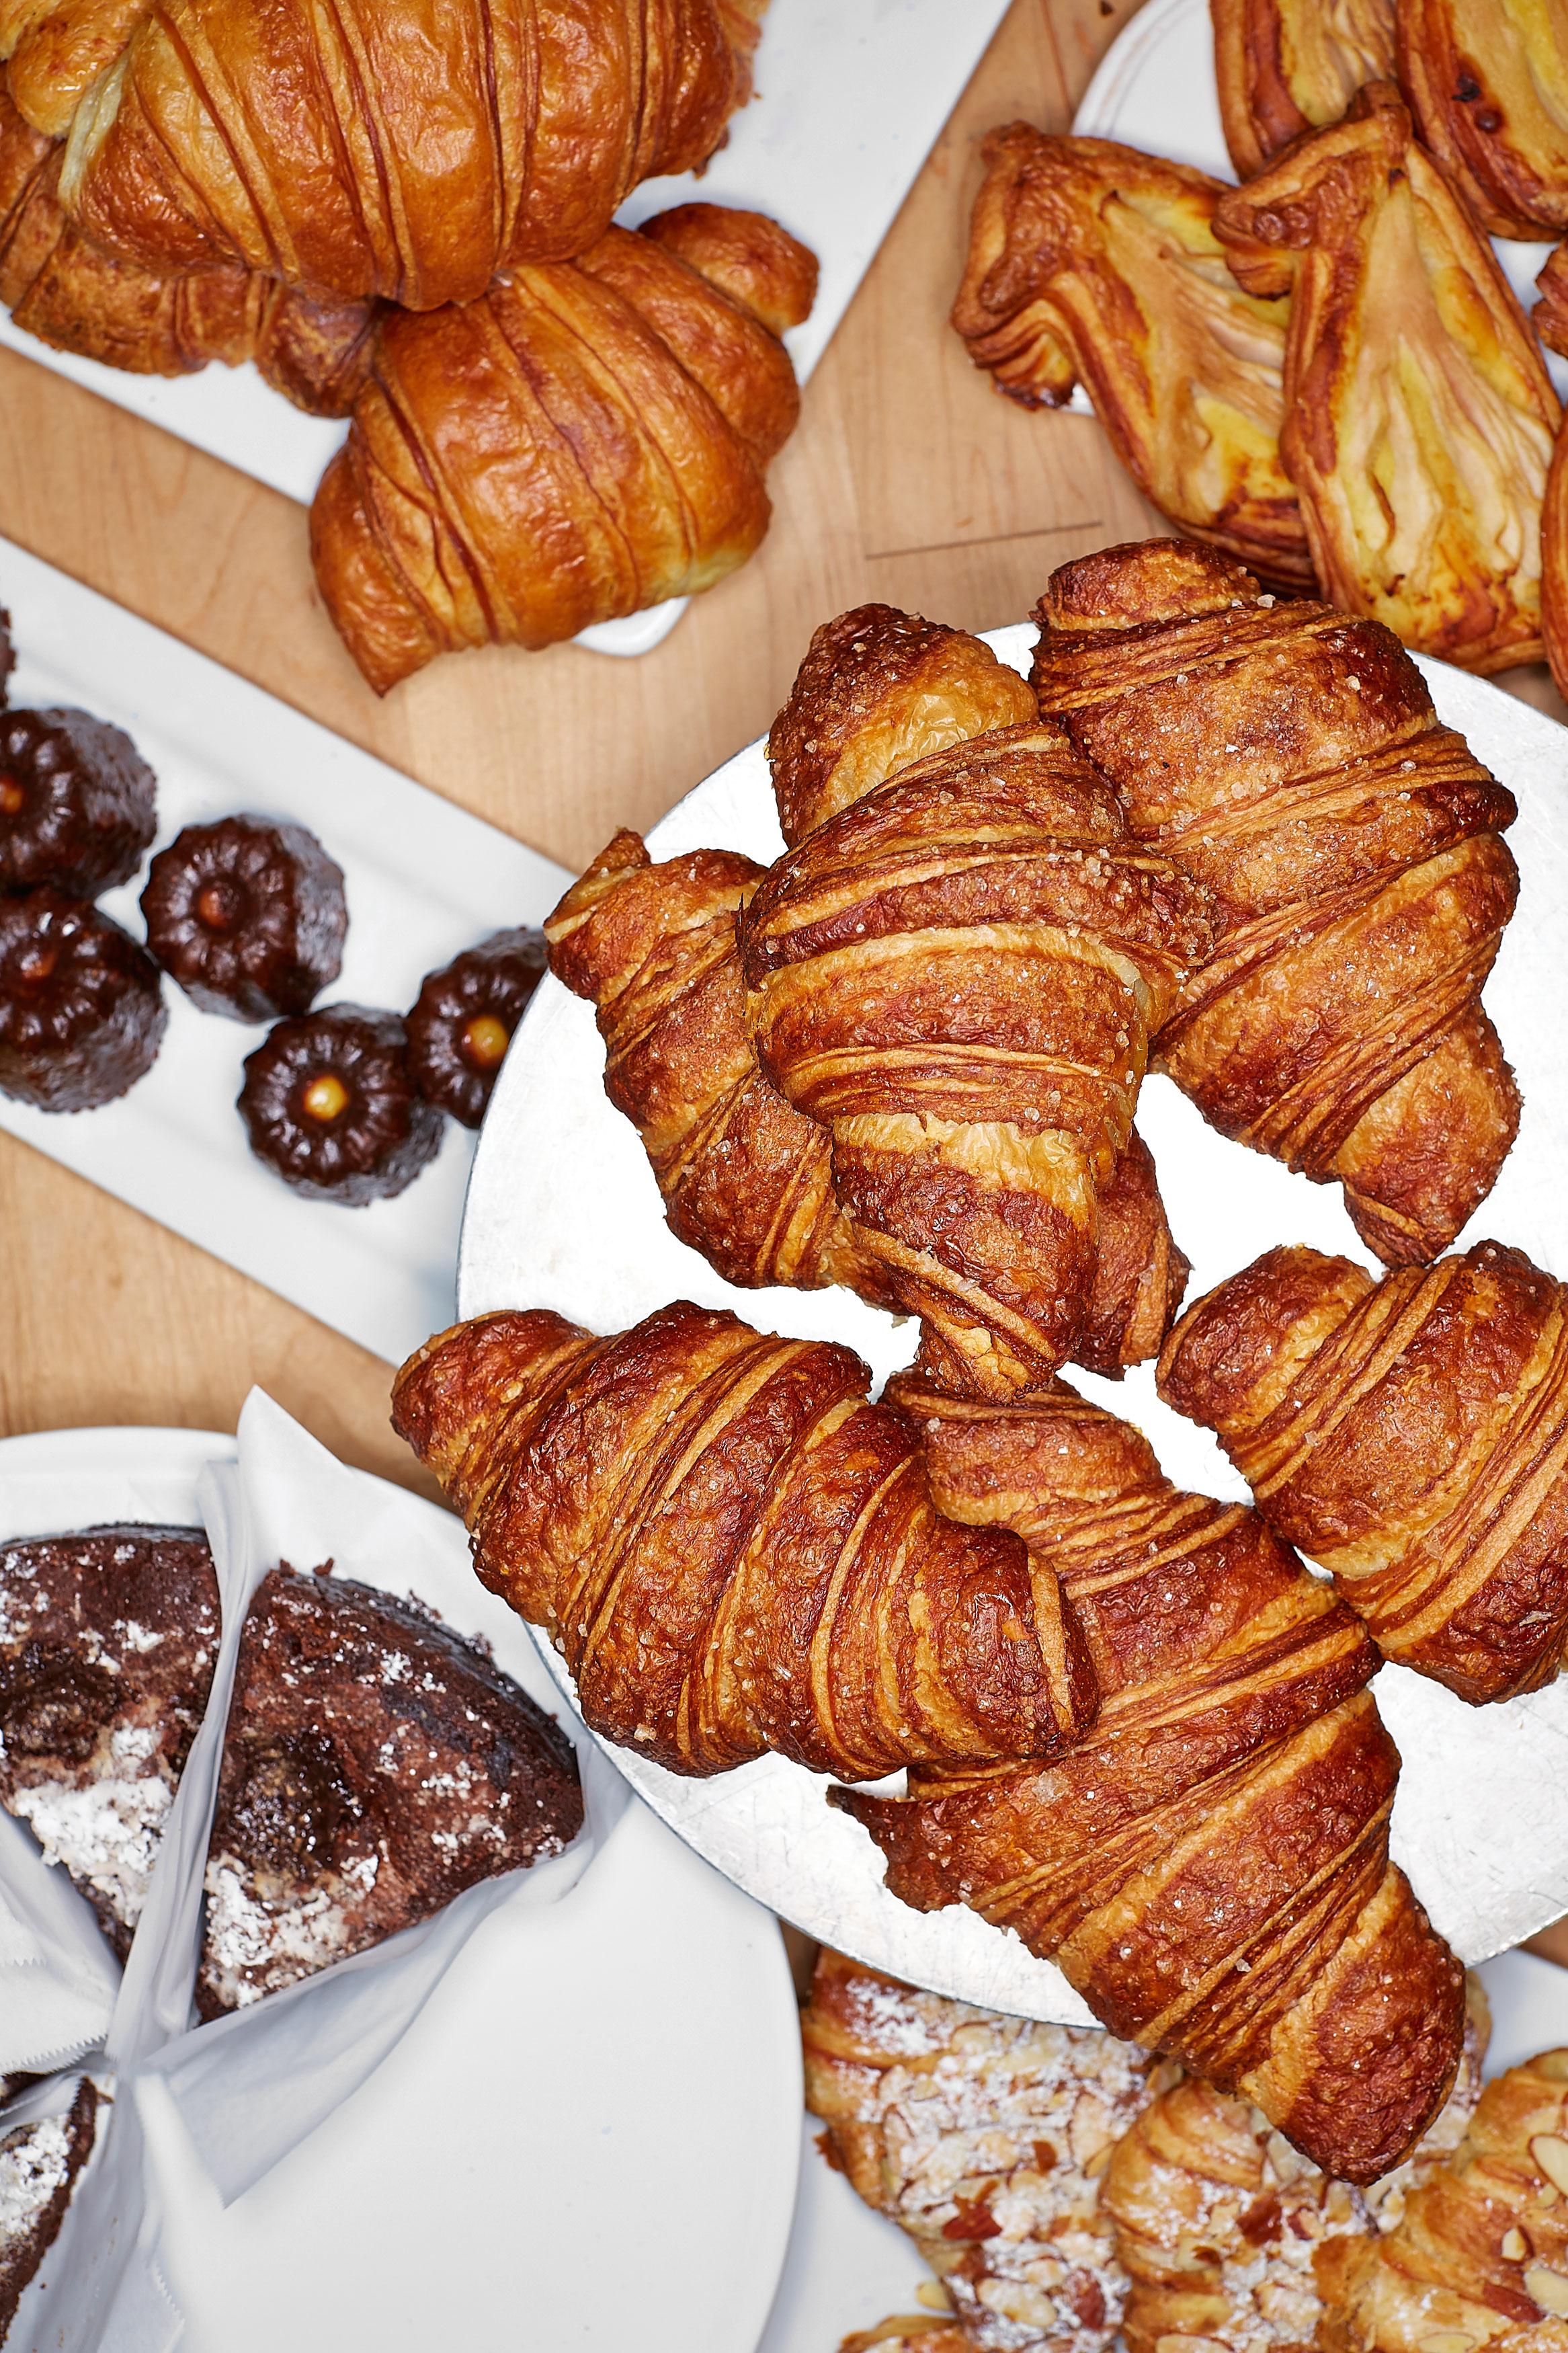 The Best Bread Bakeries In Dallas